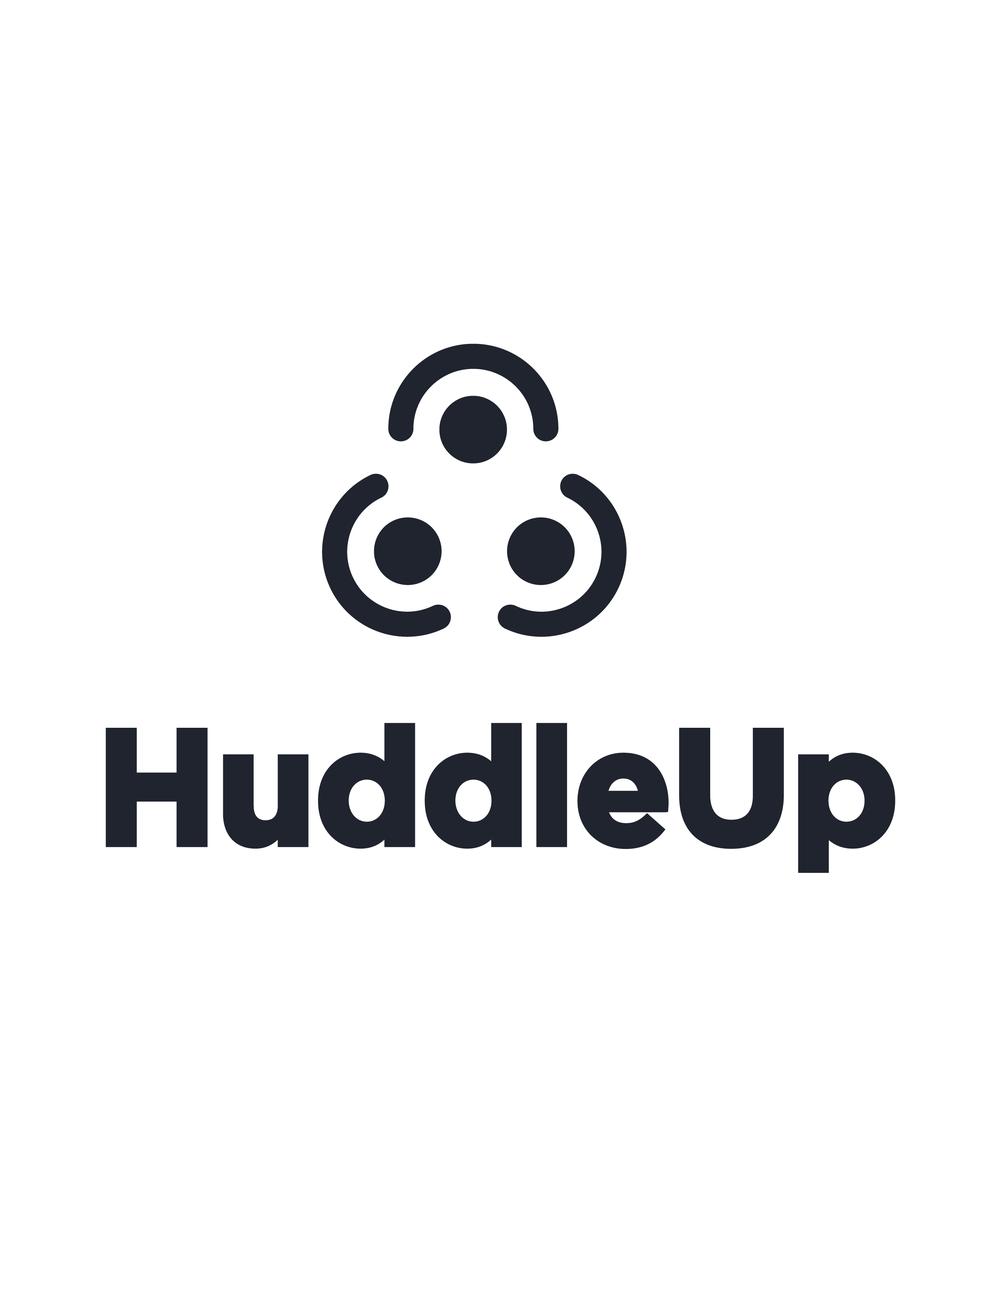 huddle-logo-02.png